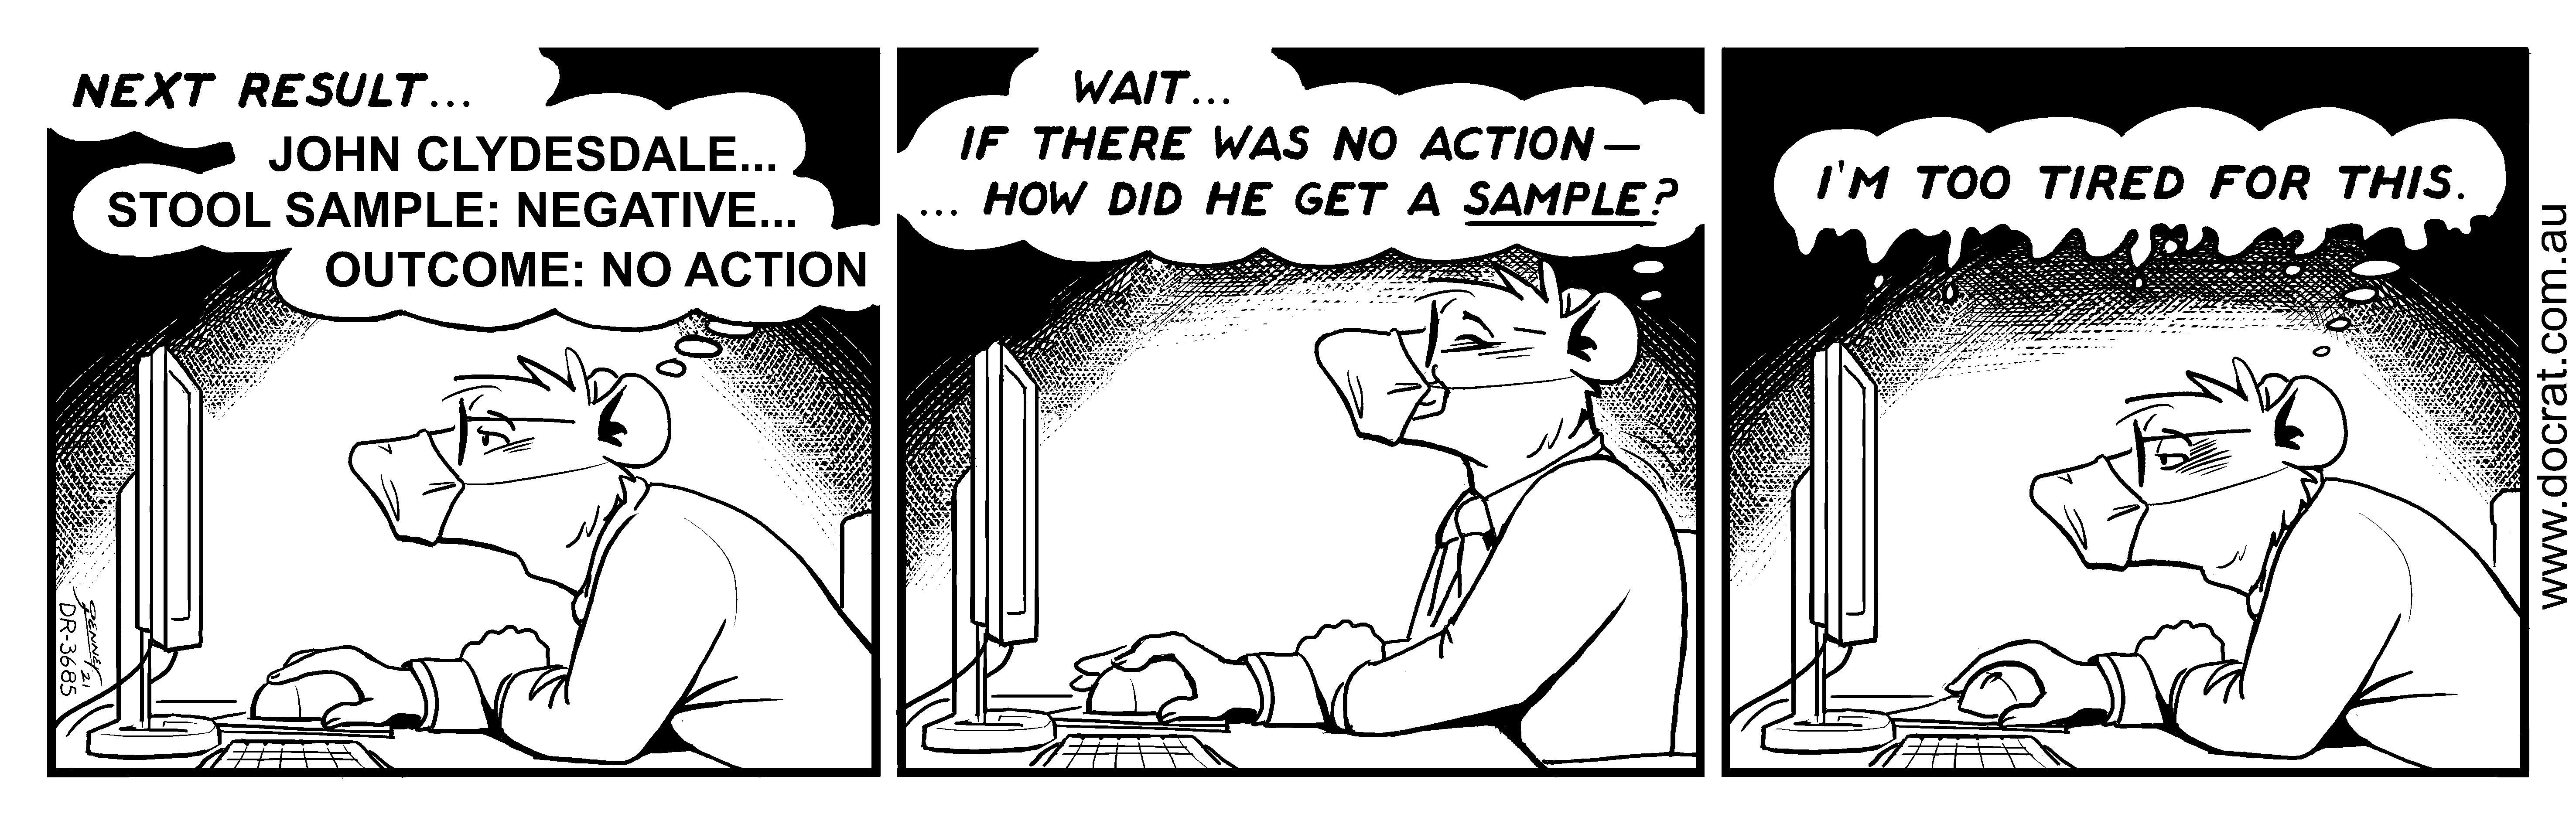 20210226